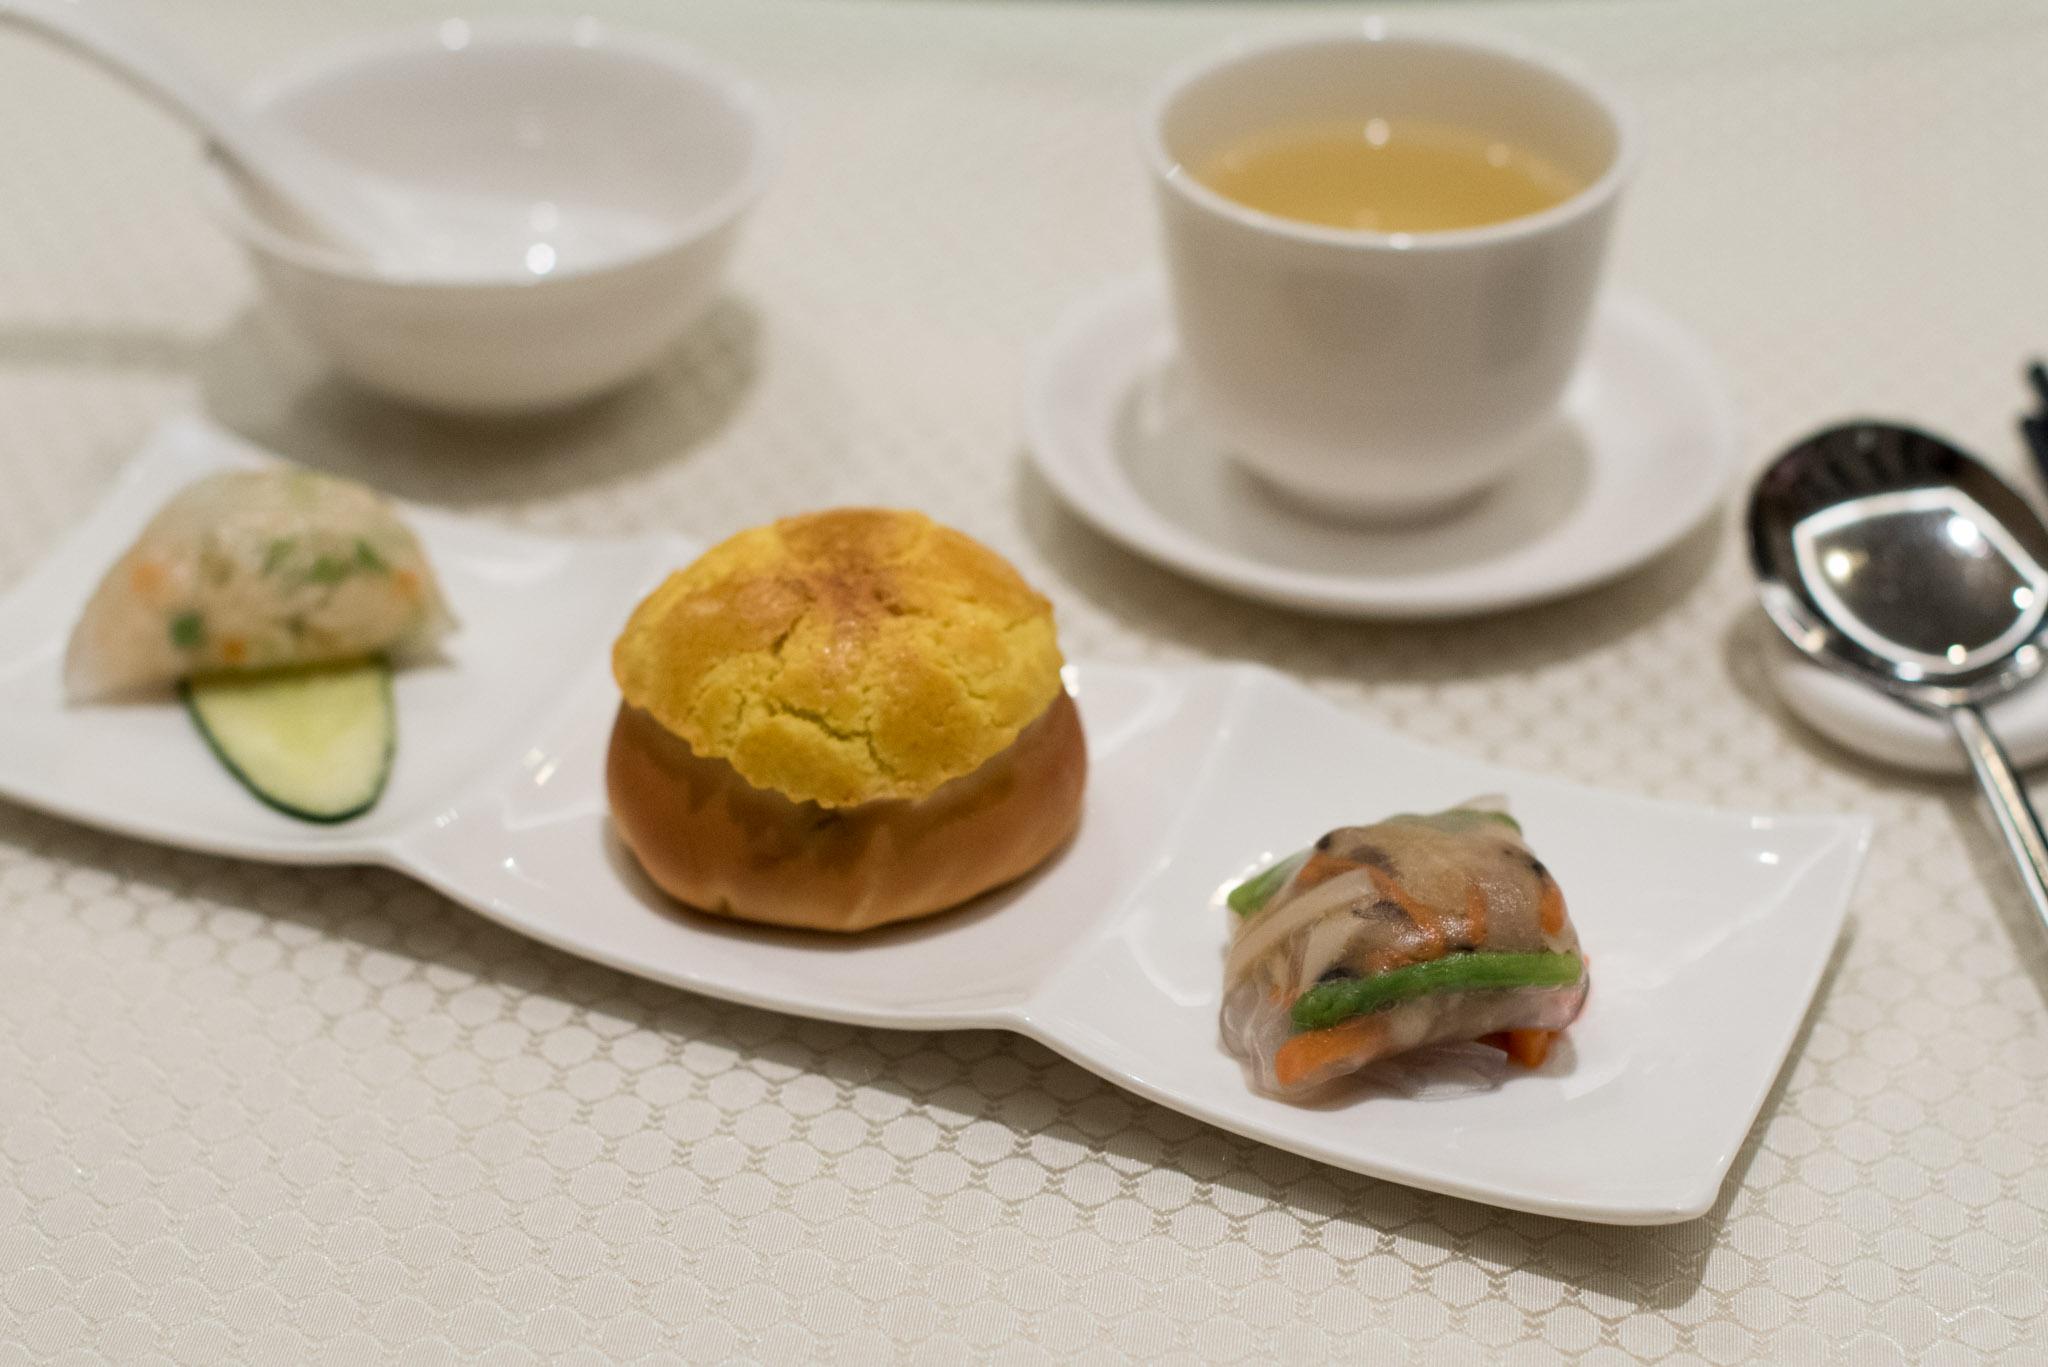 Steamed Bamboo Fungus & Vegetarian Dumpling,Baked Barbeque Pork Bun,Steamed Crab Meat & Egg White Dumpling  Wah Lok - Carlton Hotel Singapore